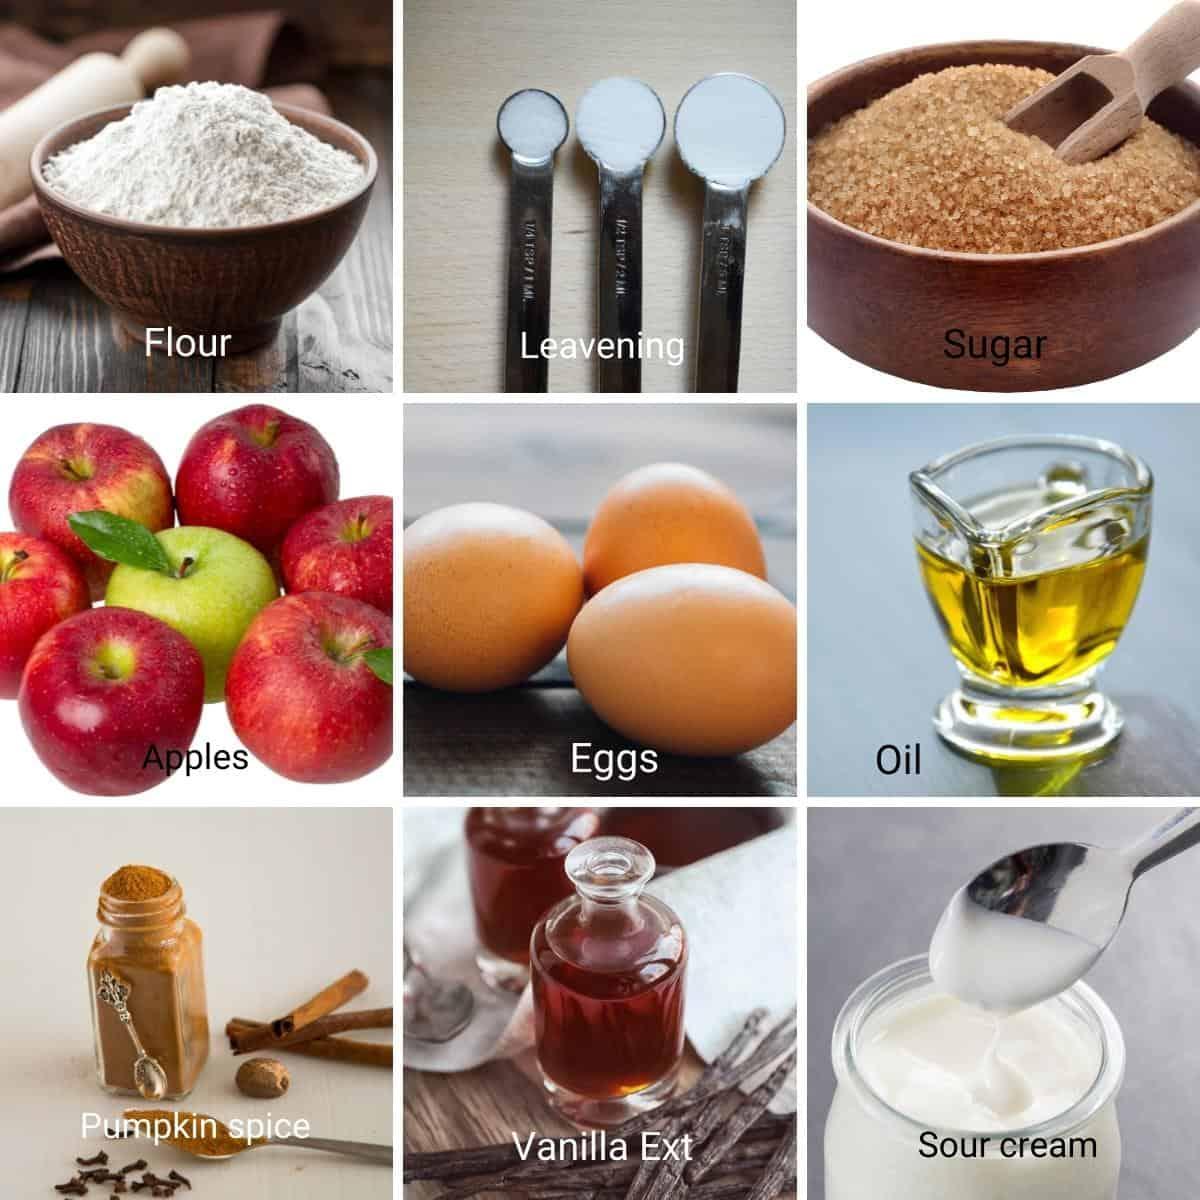 Ingredients for caramel cupcakes.